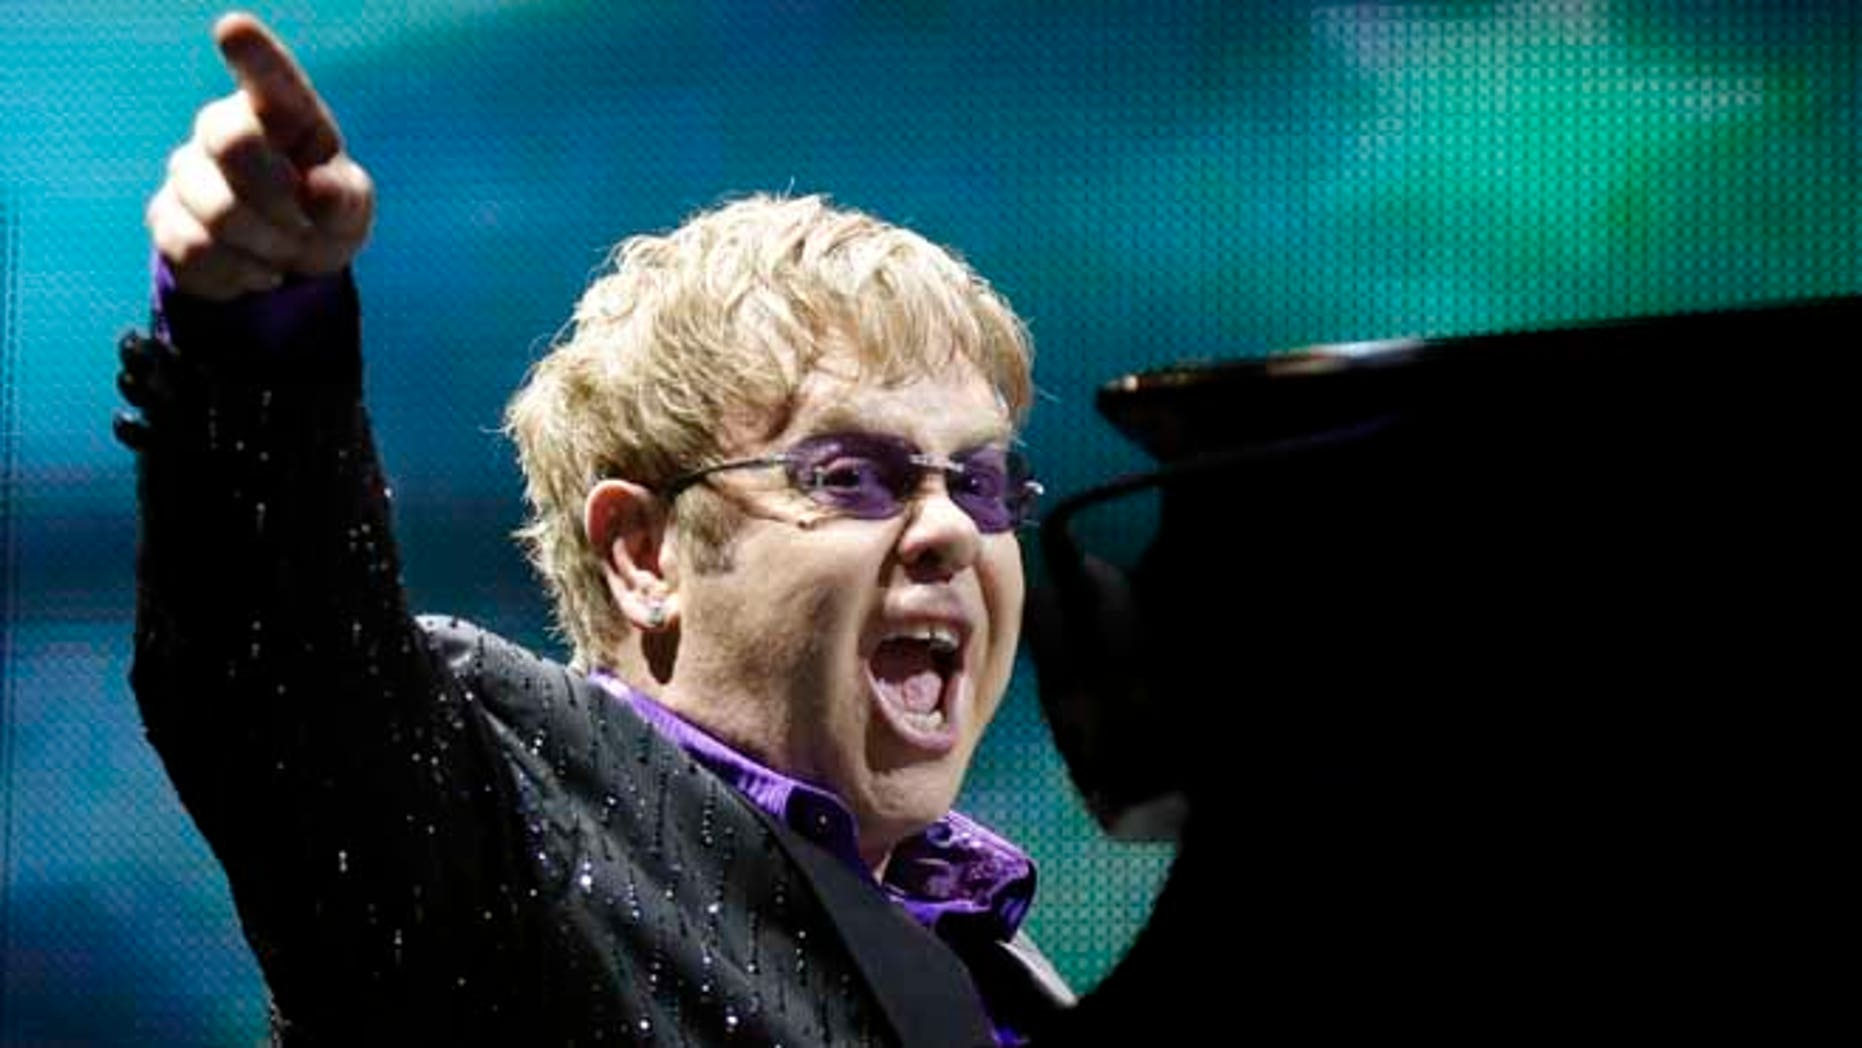 This June 30, 2012 file photo shows British pop star Elton John performing during the Euro 2012 soccer championship in Kiev, Ukraine.